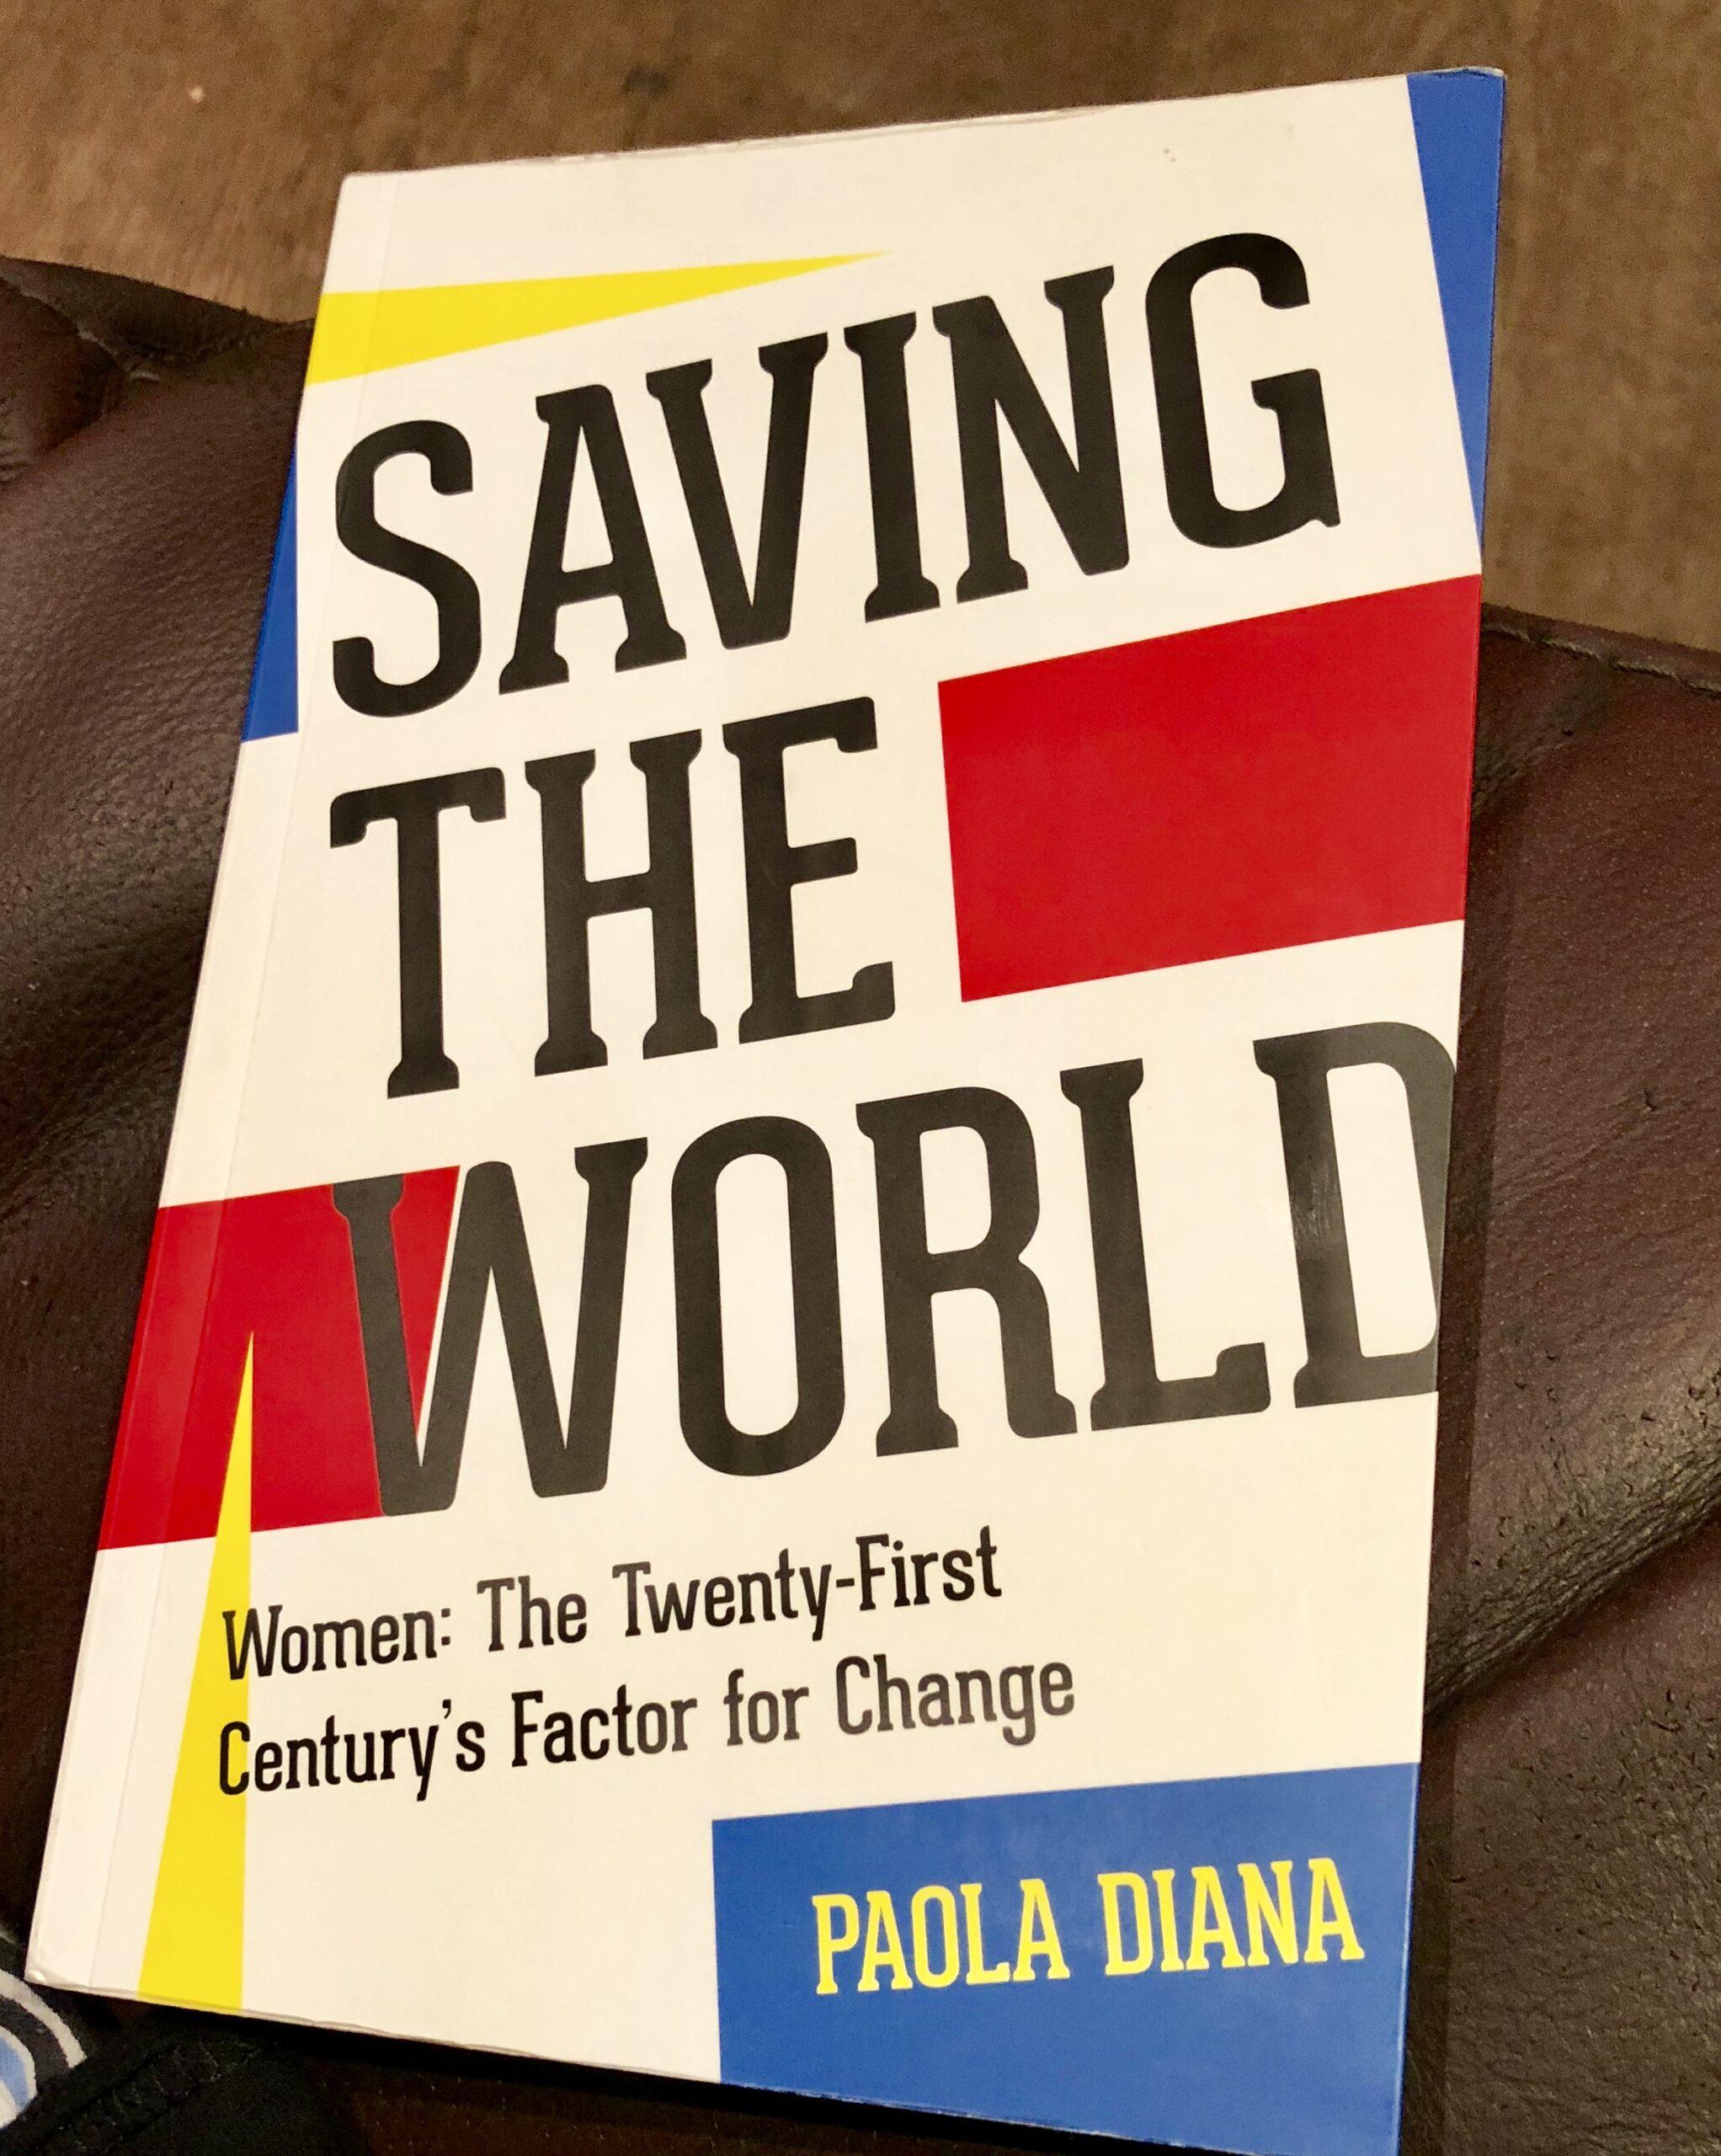 Bonus Book Review - Saving the World